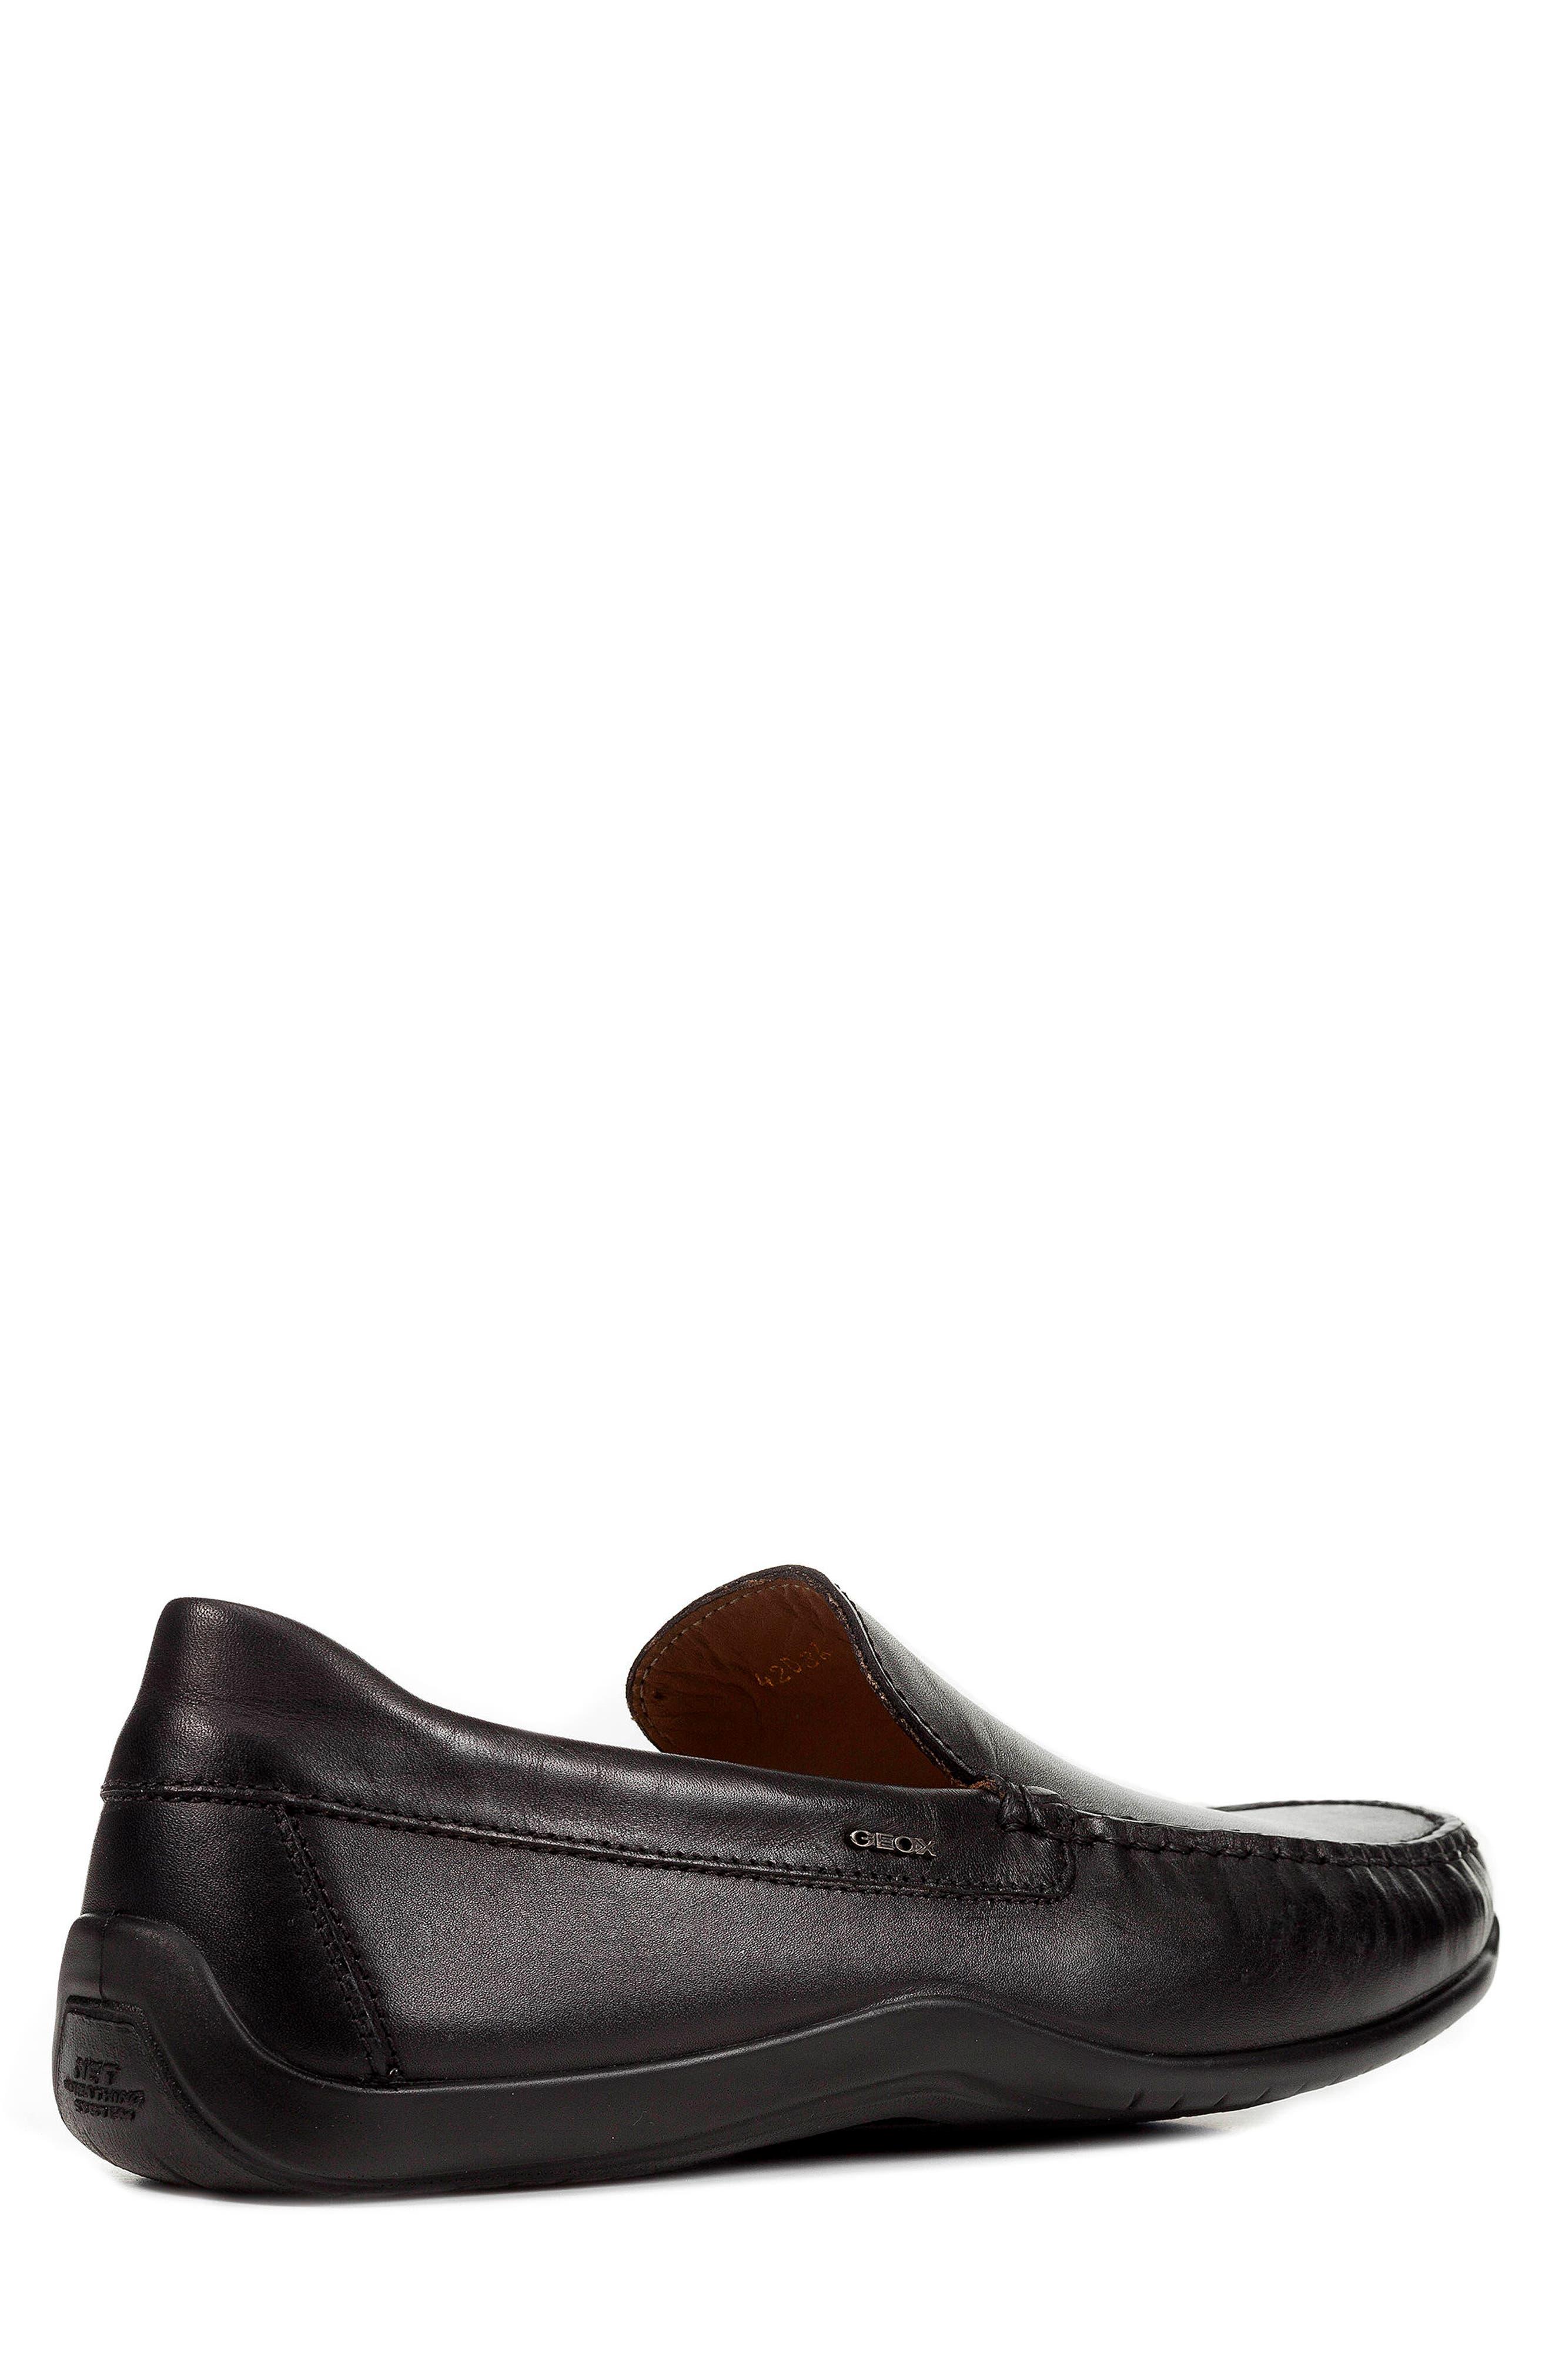 'U Xense Mox' Driving Shoe,                             Alternate thumbnail 2, color,                             Black Leather